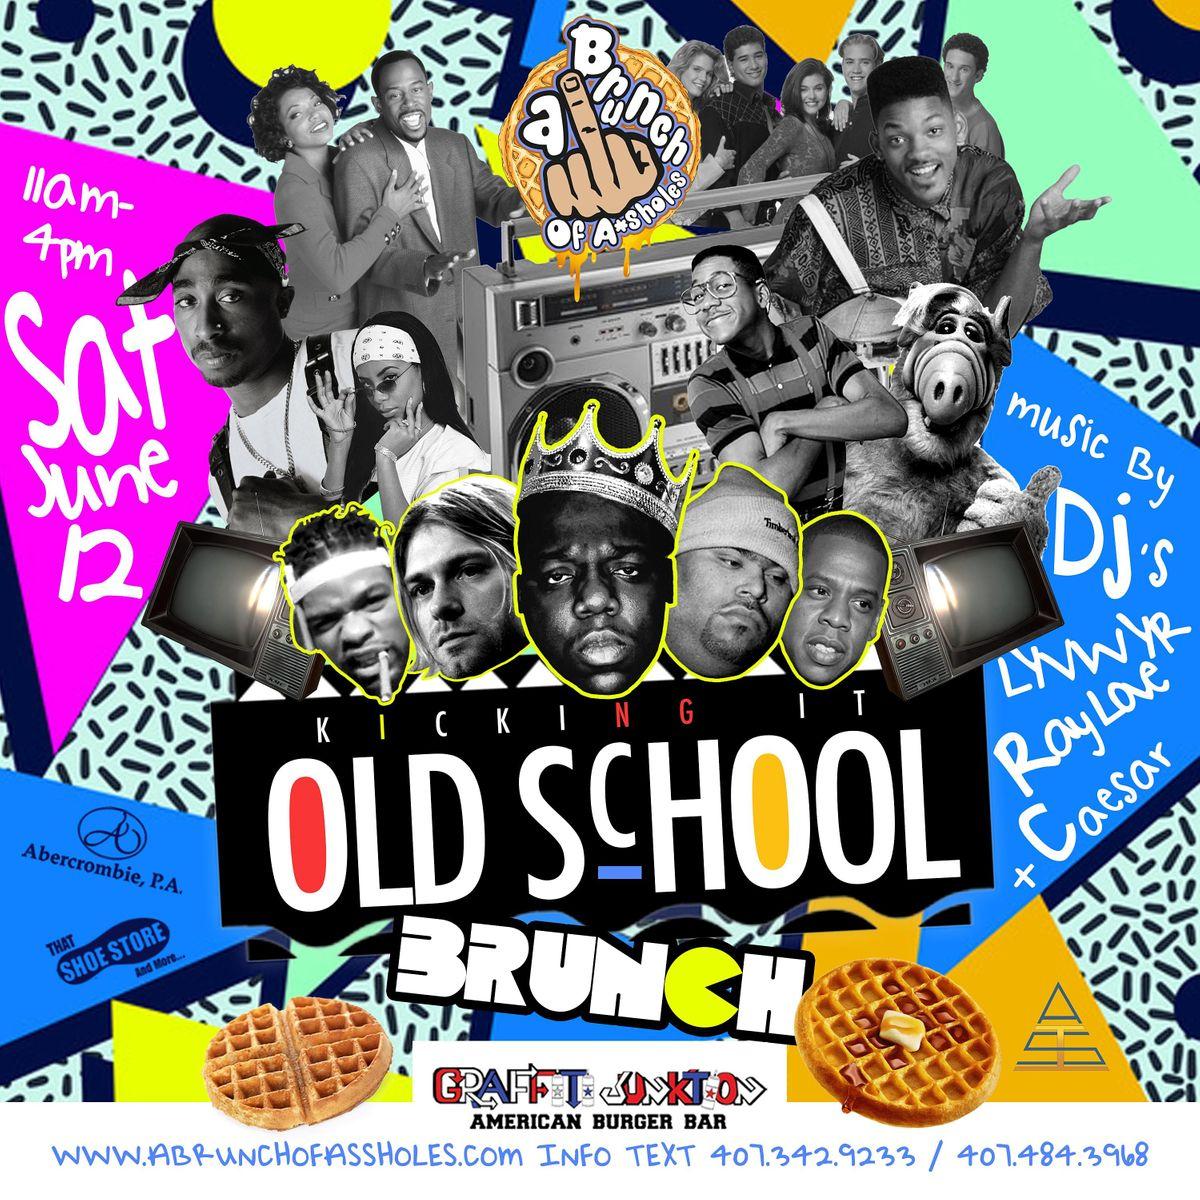 Old School Brunch Party